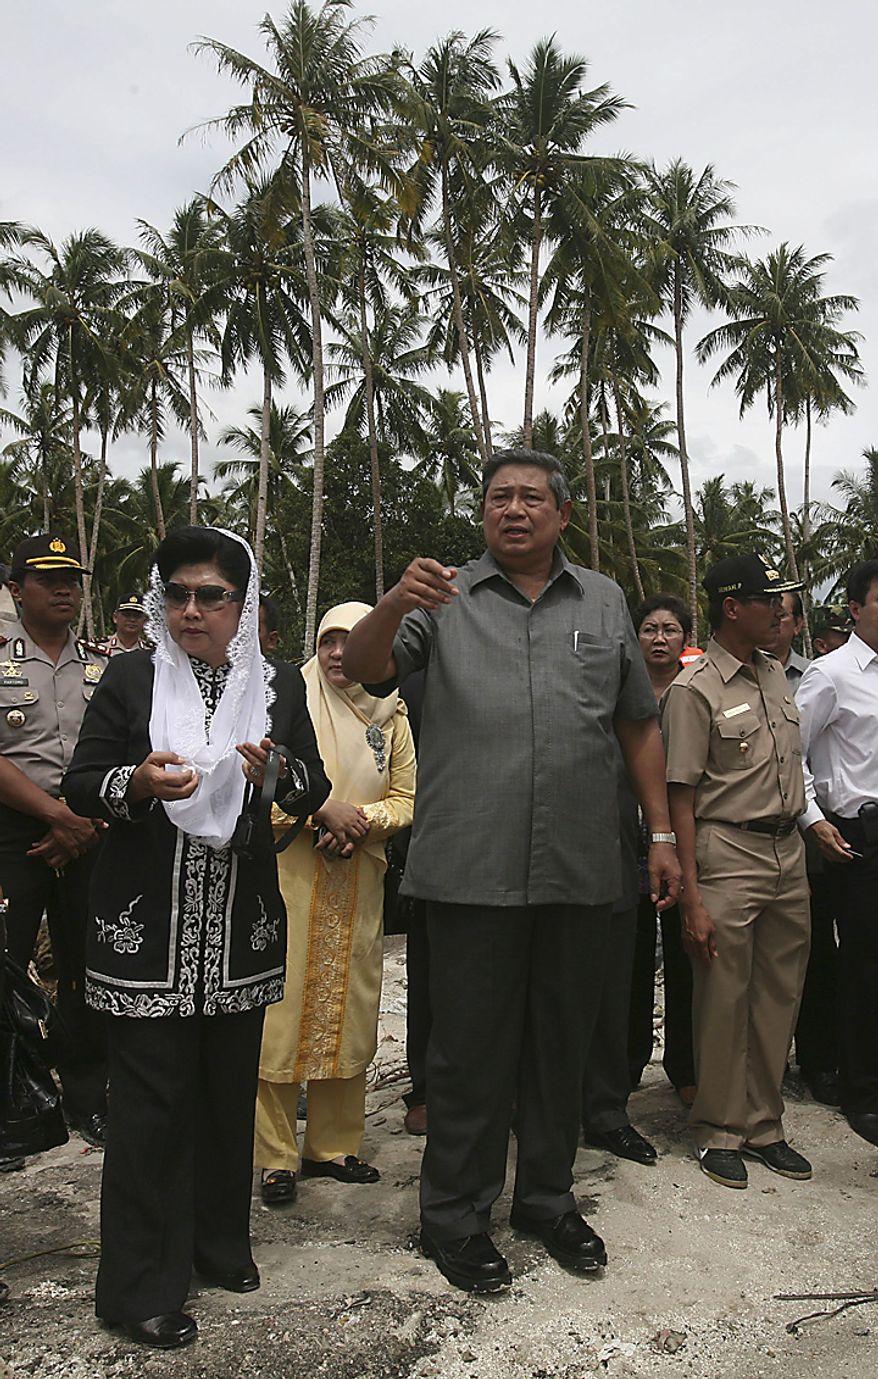 Indonesia President Susilo Bambang Yudhoyono,right, and his wife Kristiani Herawati, left, survey damages on the tsunami-ravaged Pagai island, in Mentawai Islands, Indonesia, Thursday, Oct. 28, 2010.(AP Photo/Achmad Ibrahim)